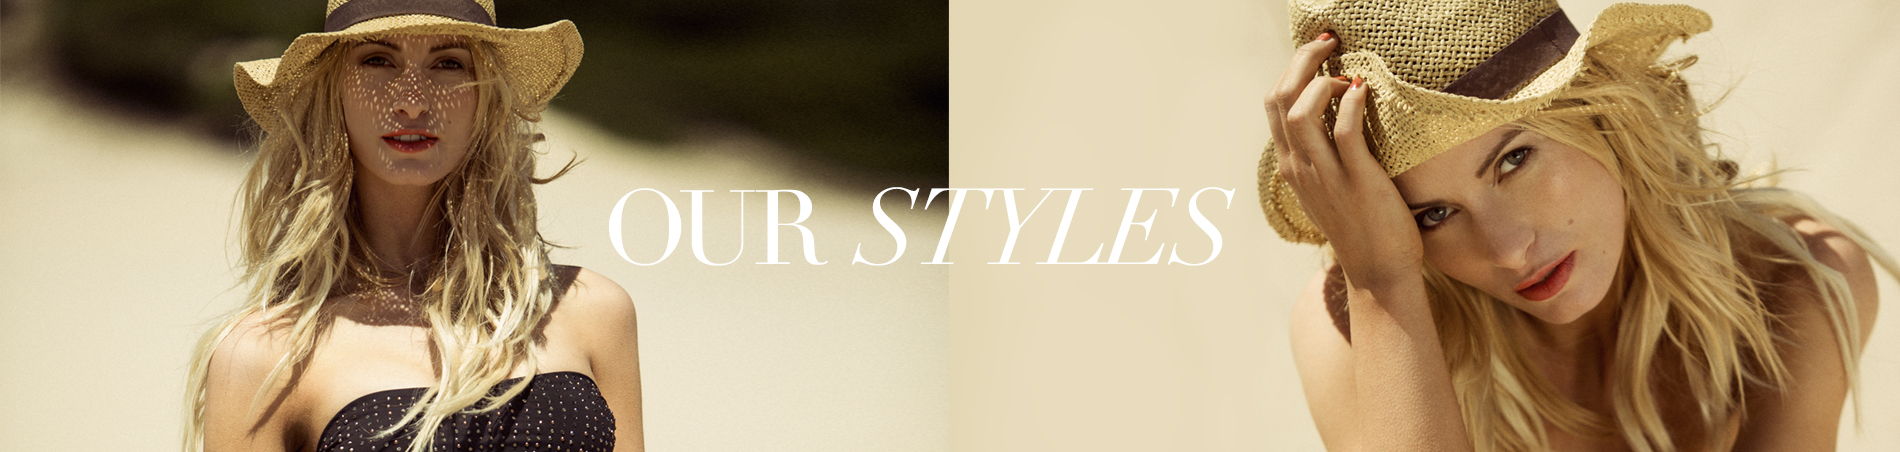 Style guide Silk and beach header